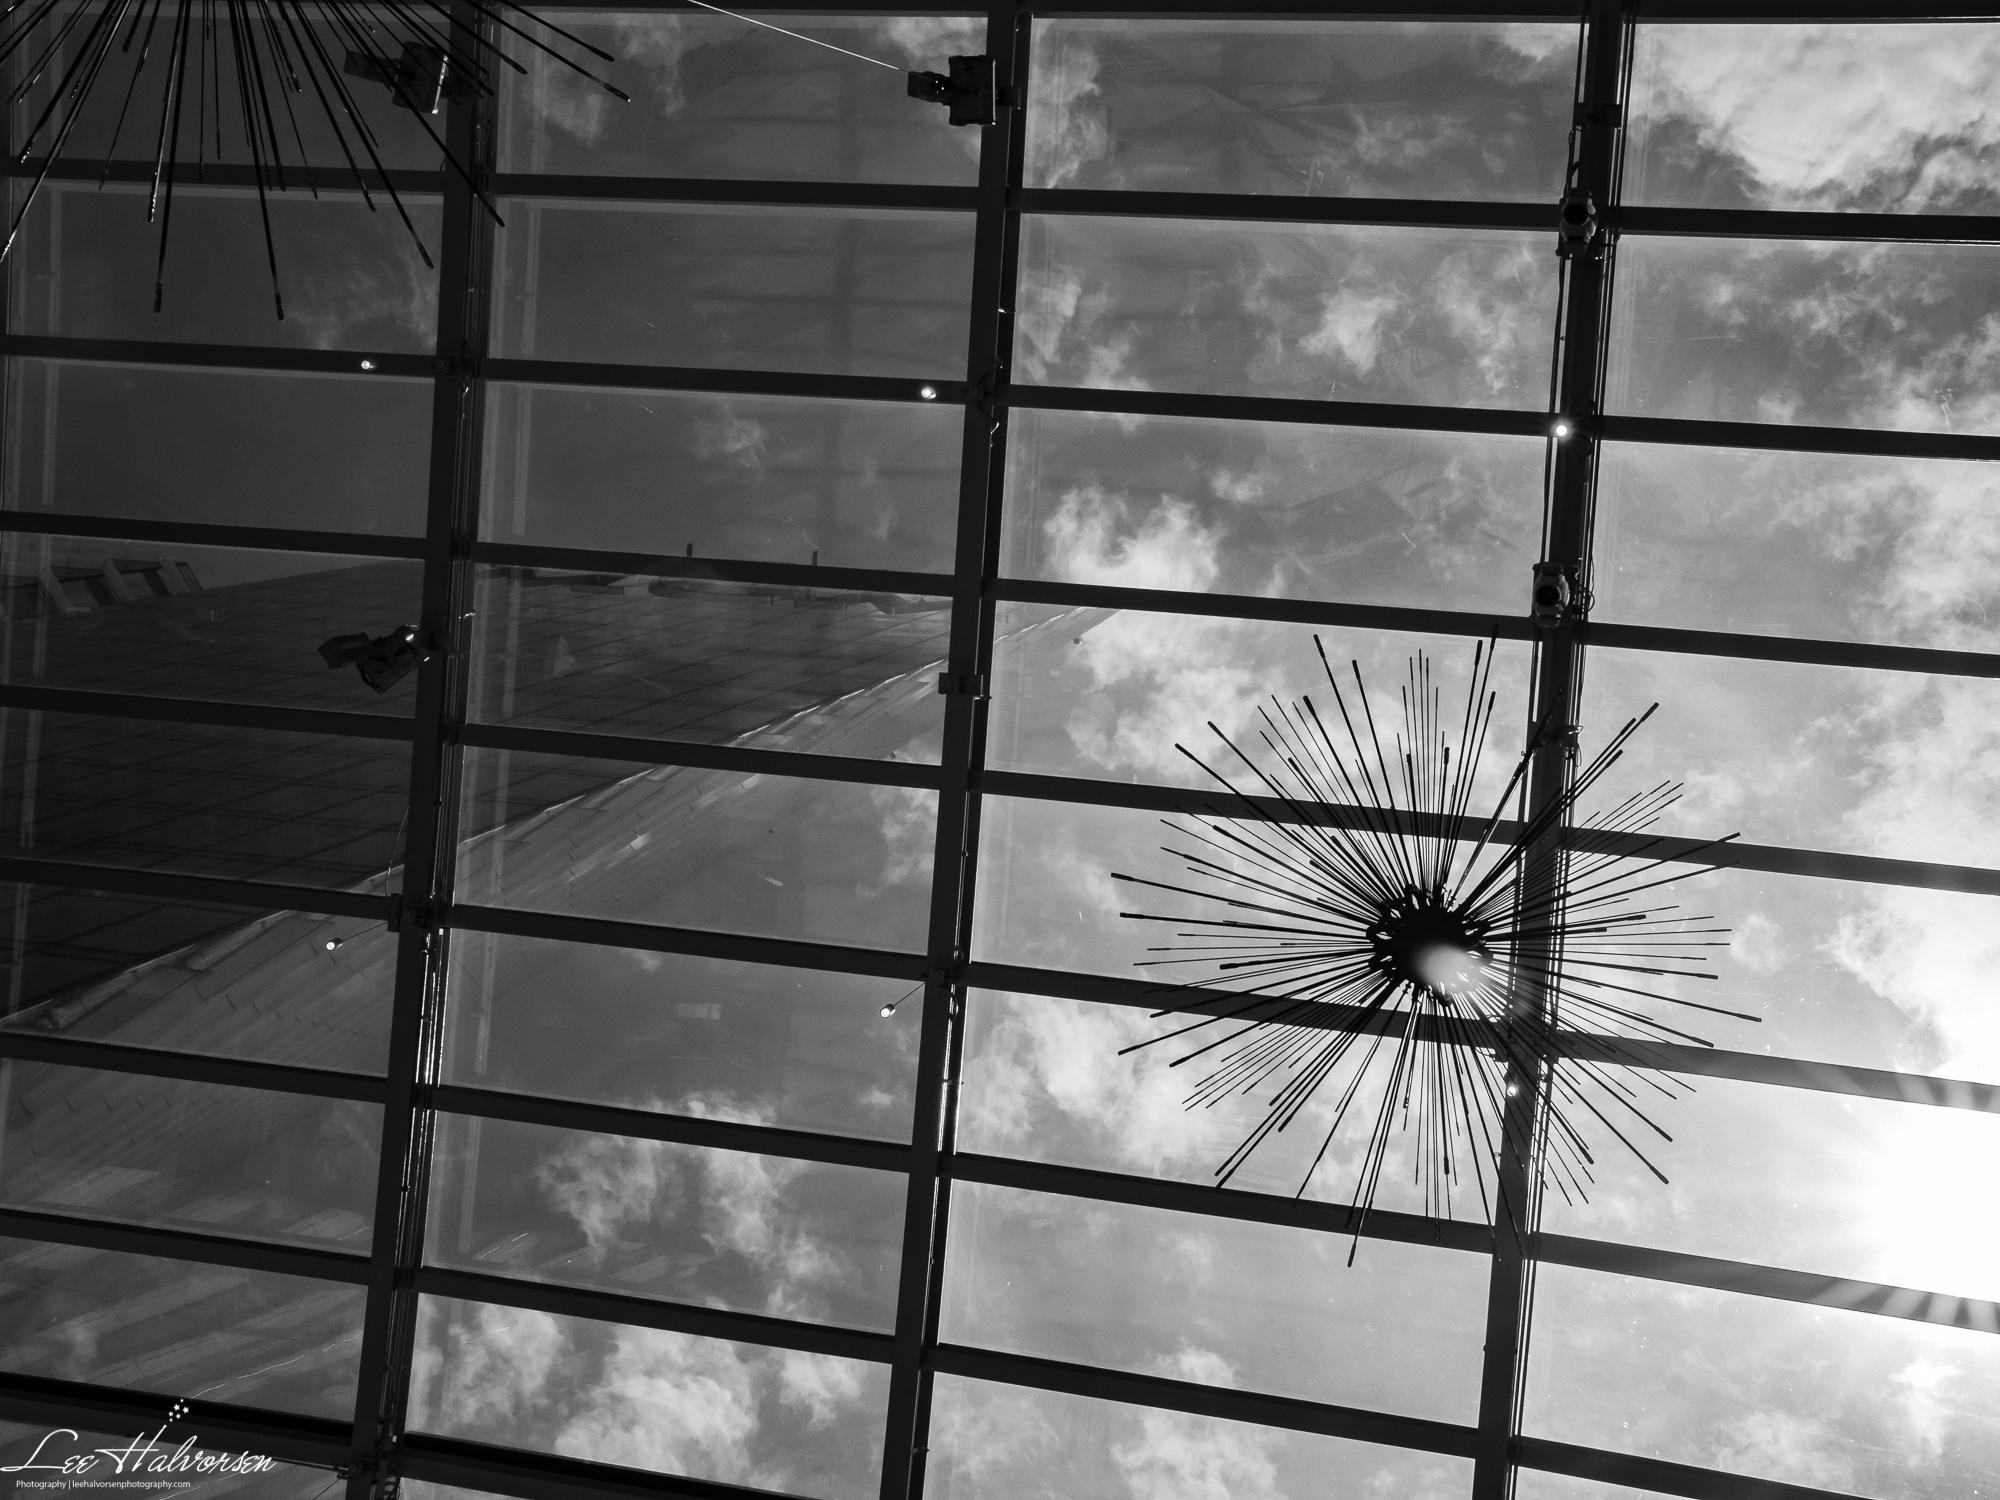 MGM National Harbor Hotel Thru Glass Ceiling